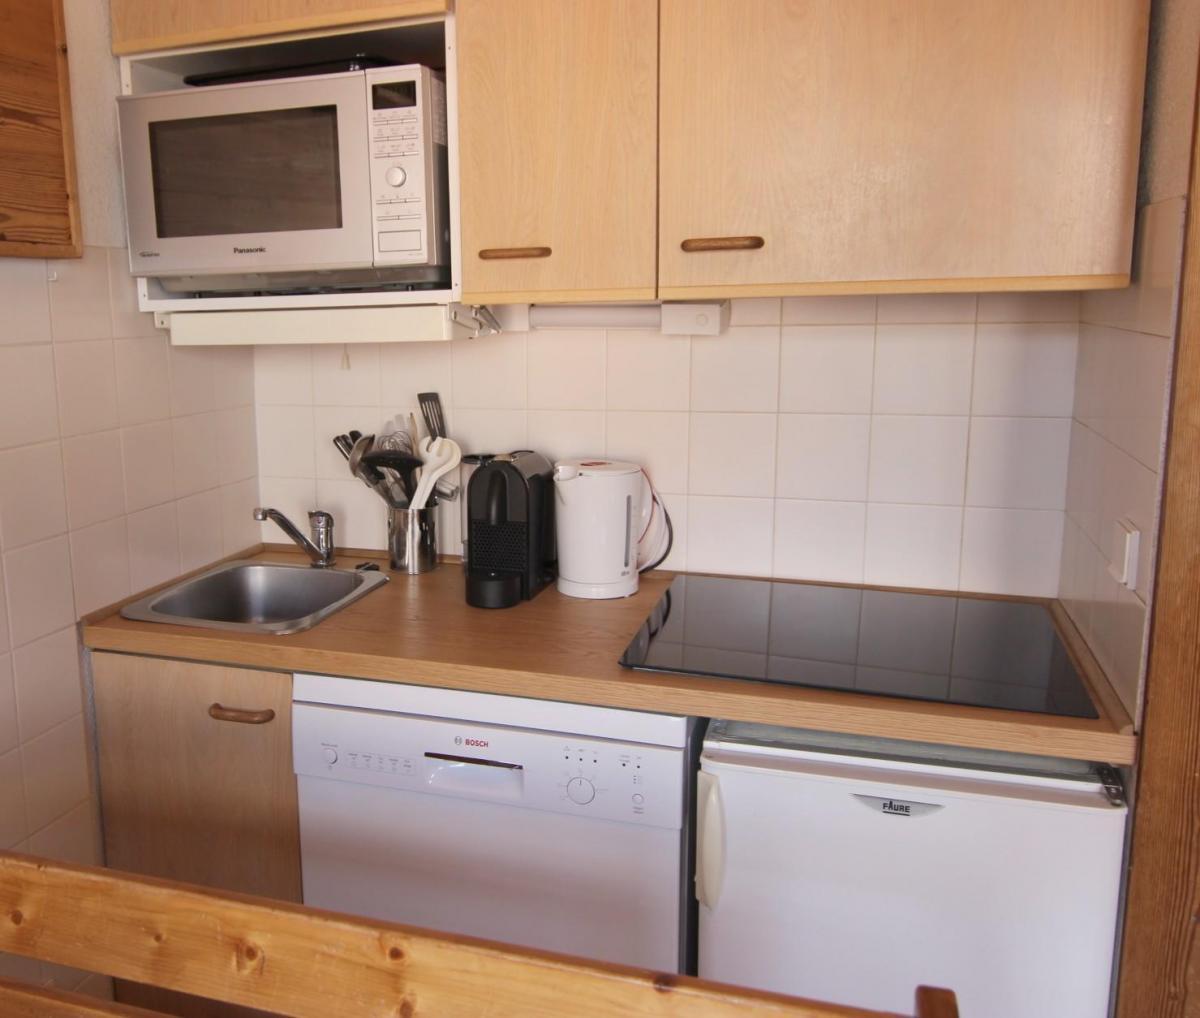 Location au ski Appartement 2 pièces mezzanine 6 personnes (100) - Residence Reine Blanche - Val Thorens - Kitchenette